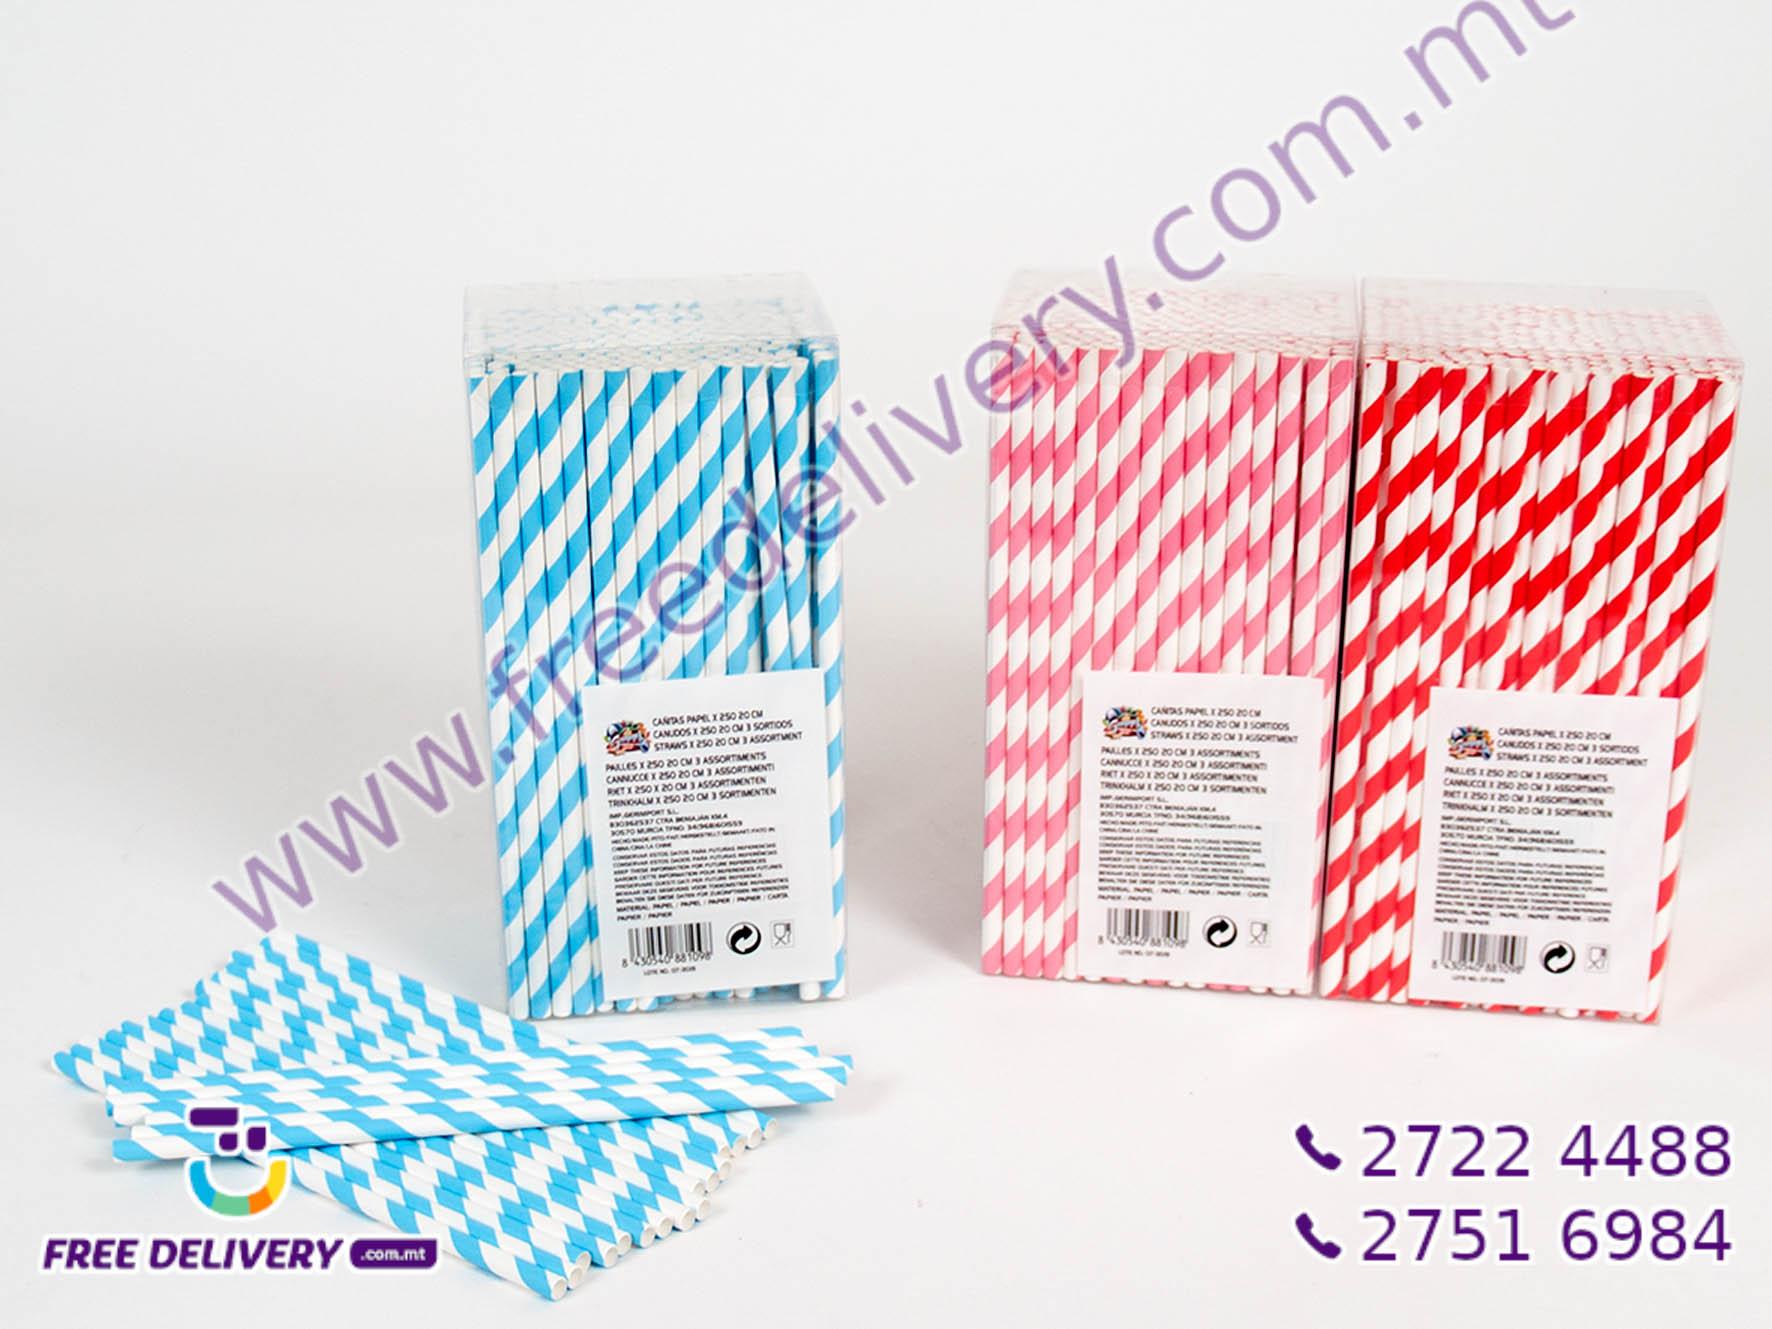 250 PAPER STRAW SET 20CMx0.6CM GE881098